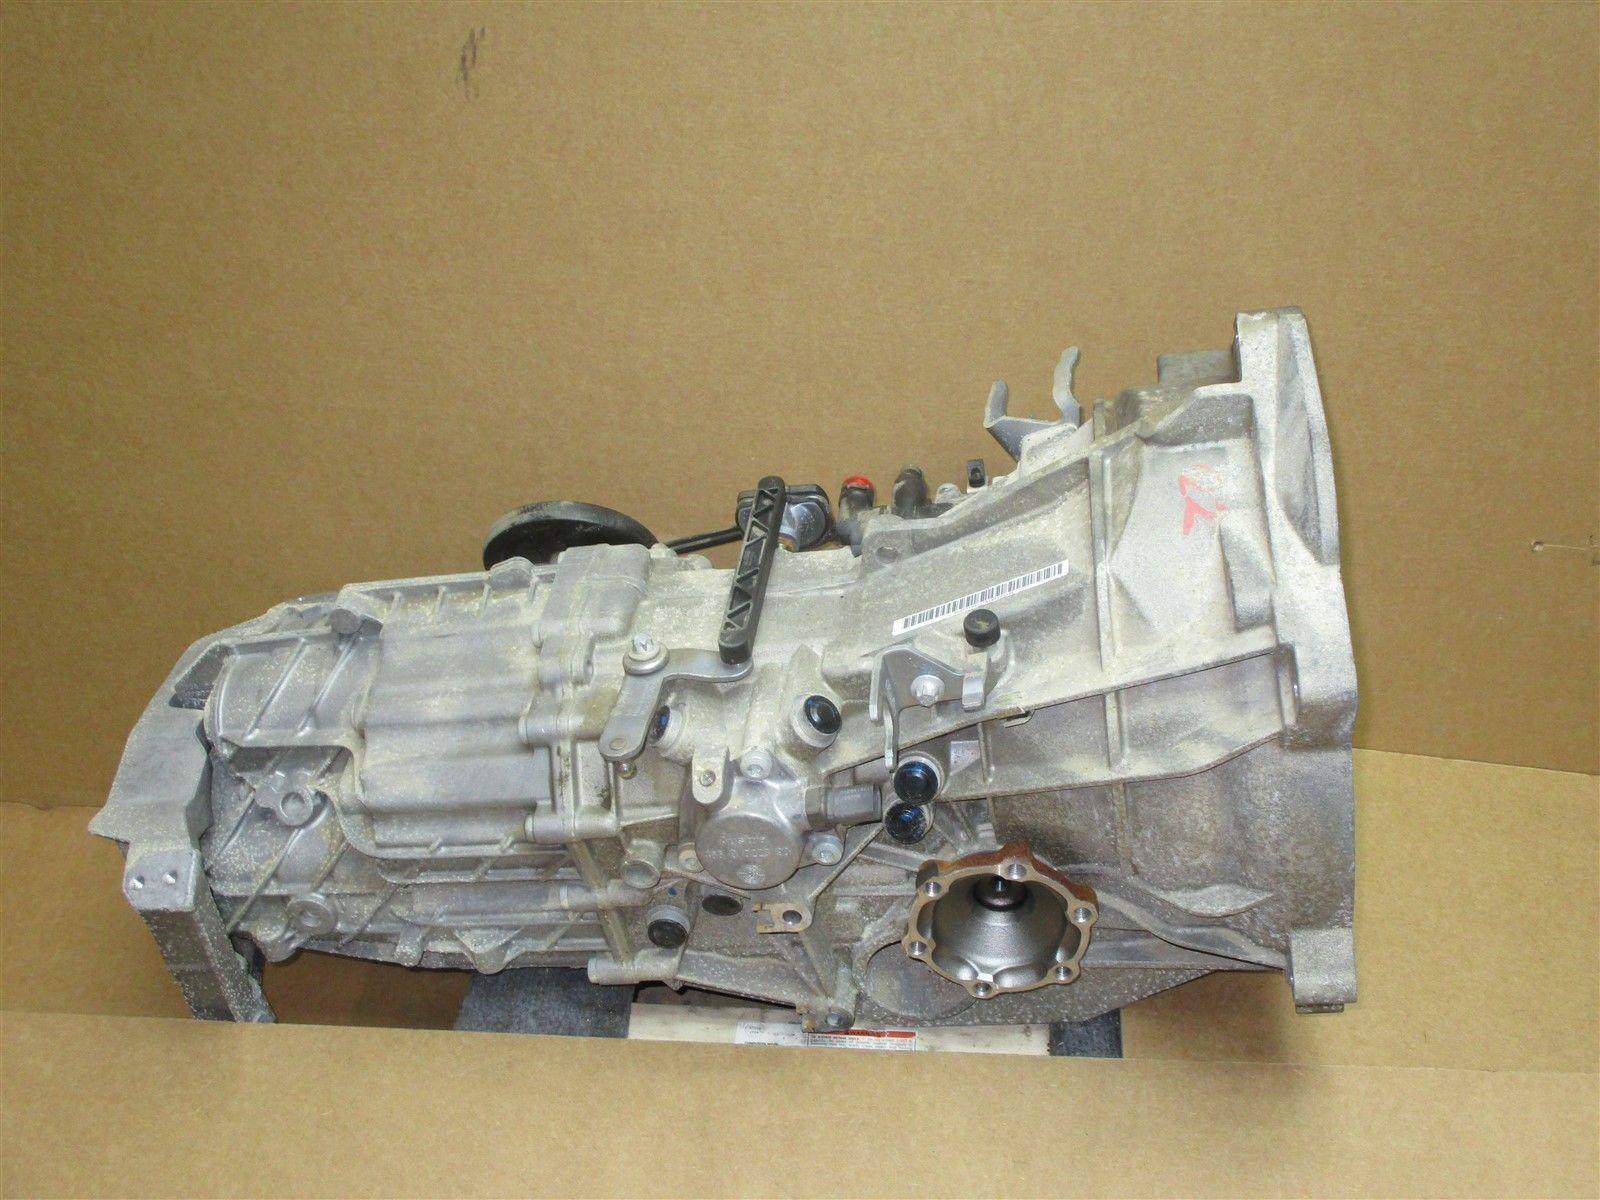 10 Boxster S RWD Porsche 987 6 SPEED MANUAL TRANSMISSION GEAR BOX G87.40  22,906